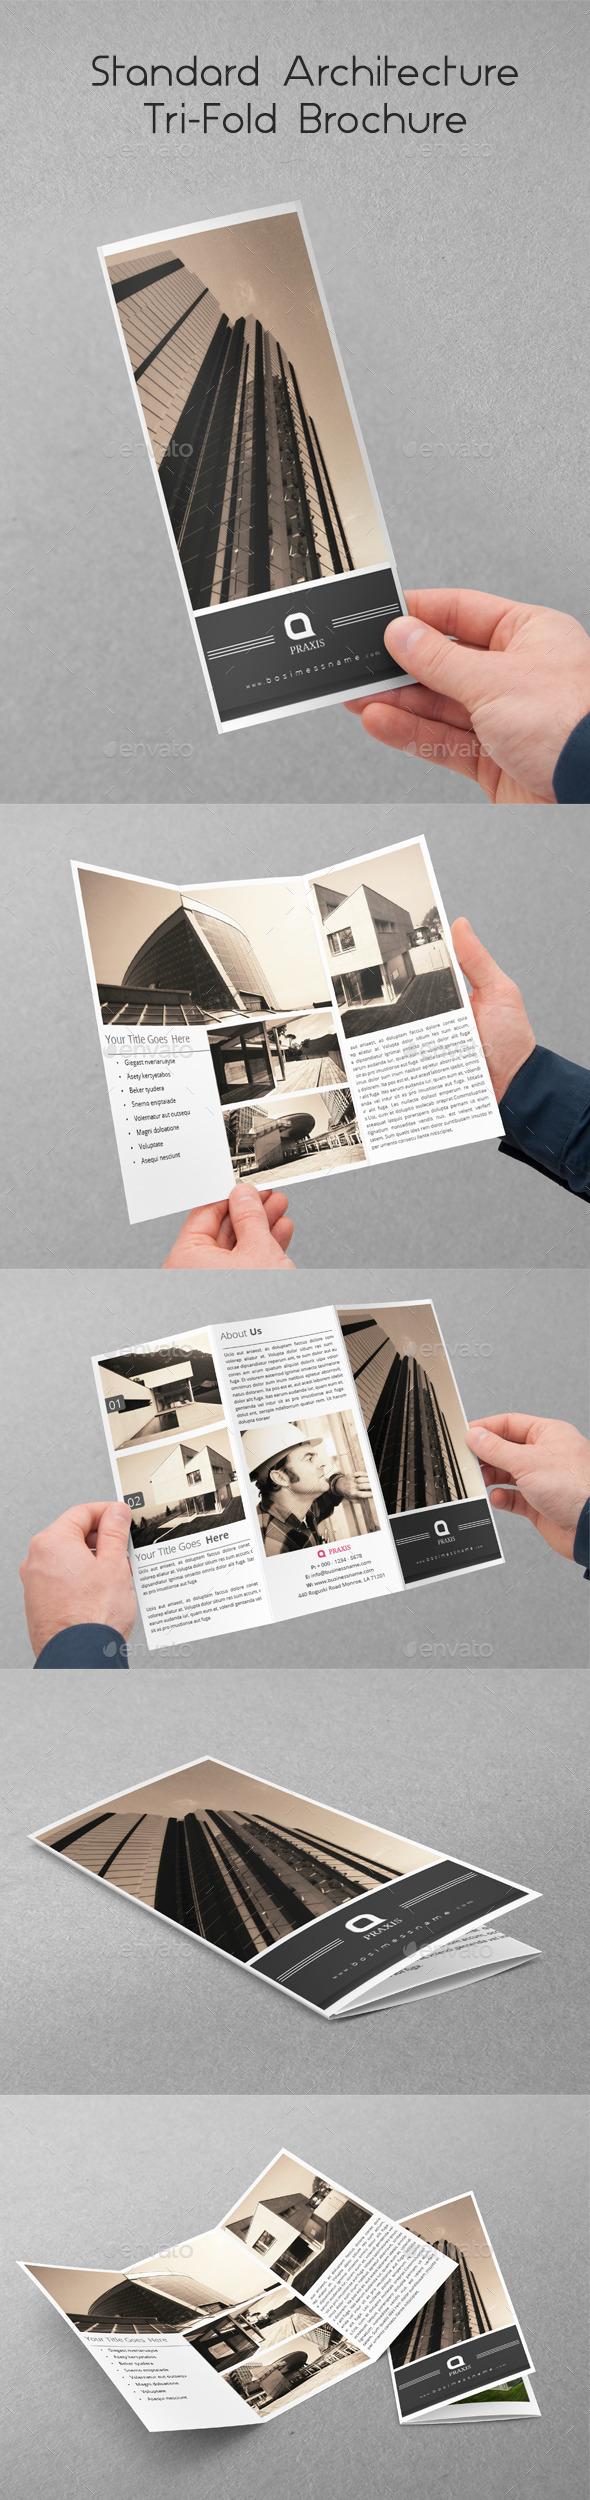 Standard Architecture Tri-Fold Brochure - Brochures Print Templates